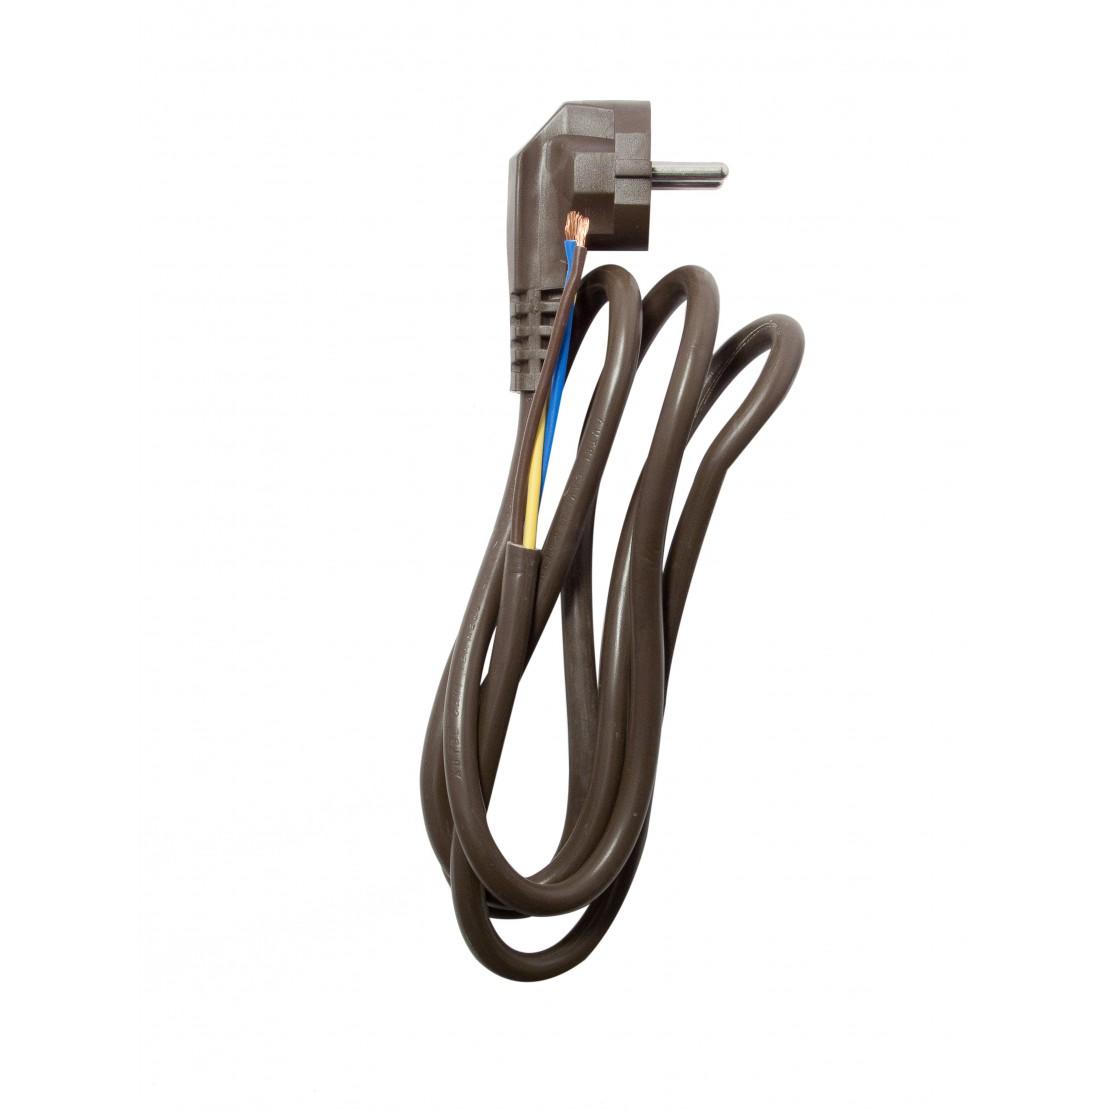 Cable HO5VVF - 3m - 3x1,5mm2 -Marrón(SCH)